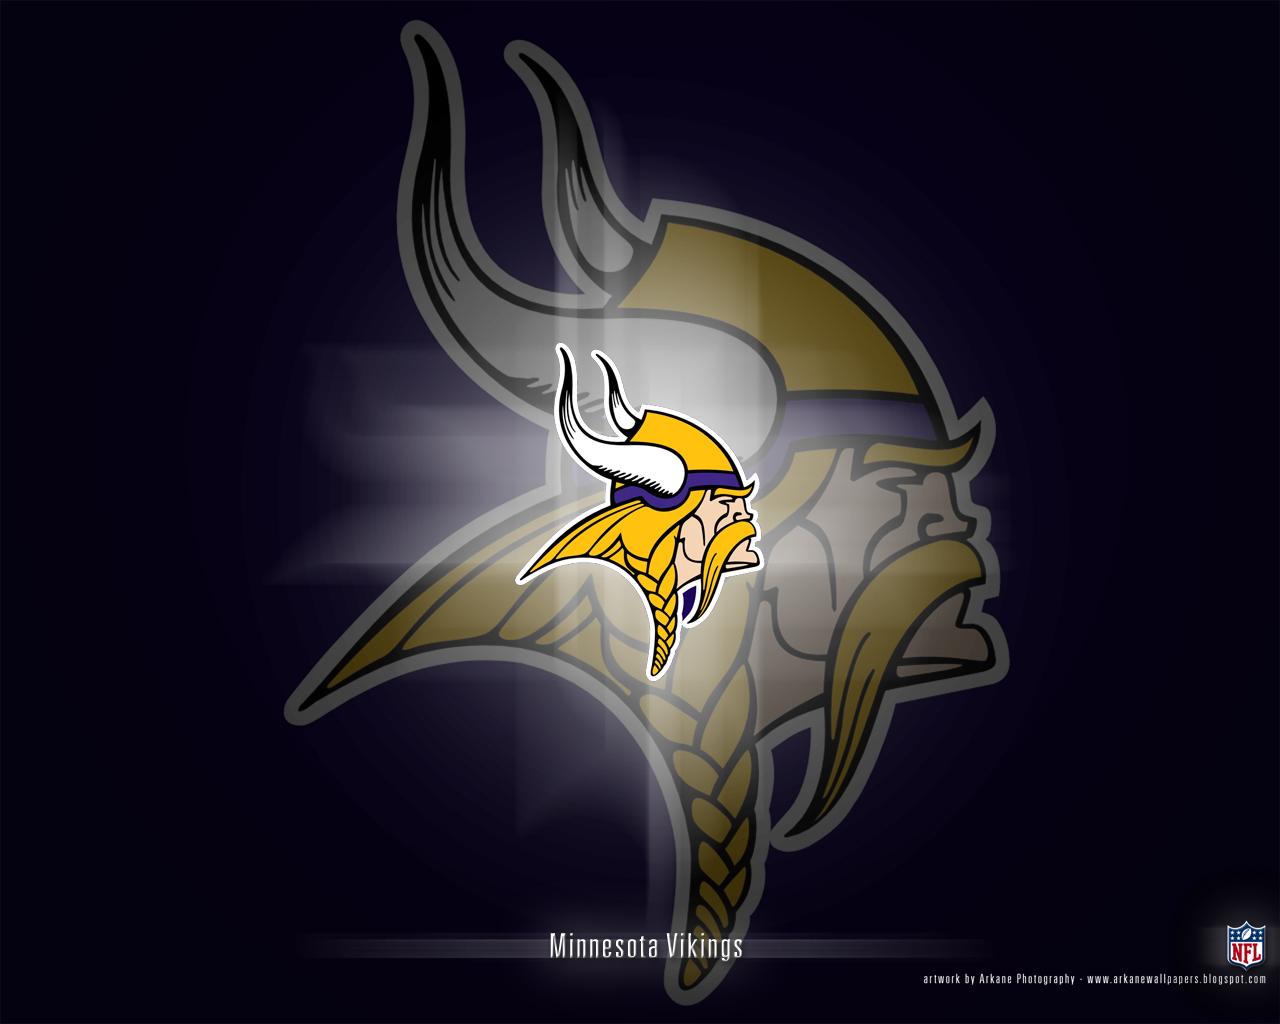 Arkane NFL Wallpapers Minnesota Vikings   Vol 1 1280x1024